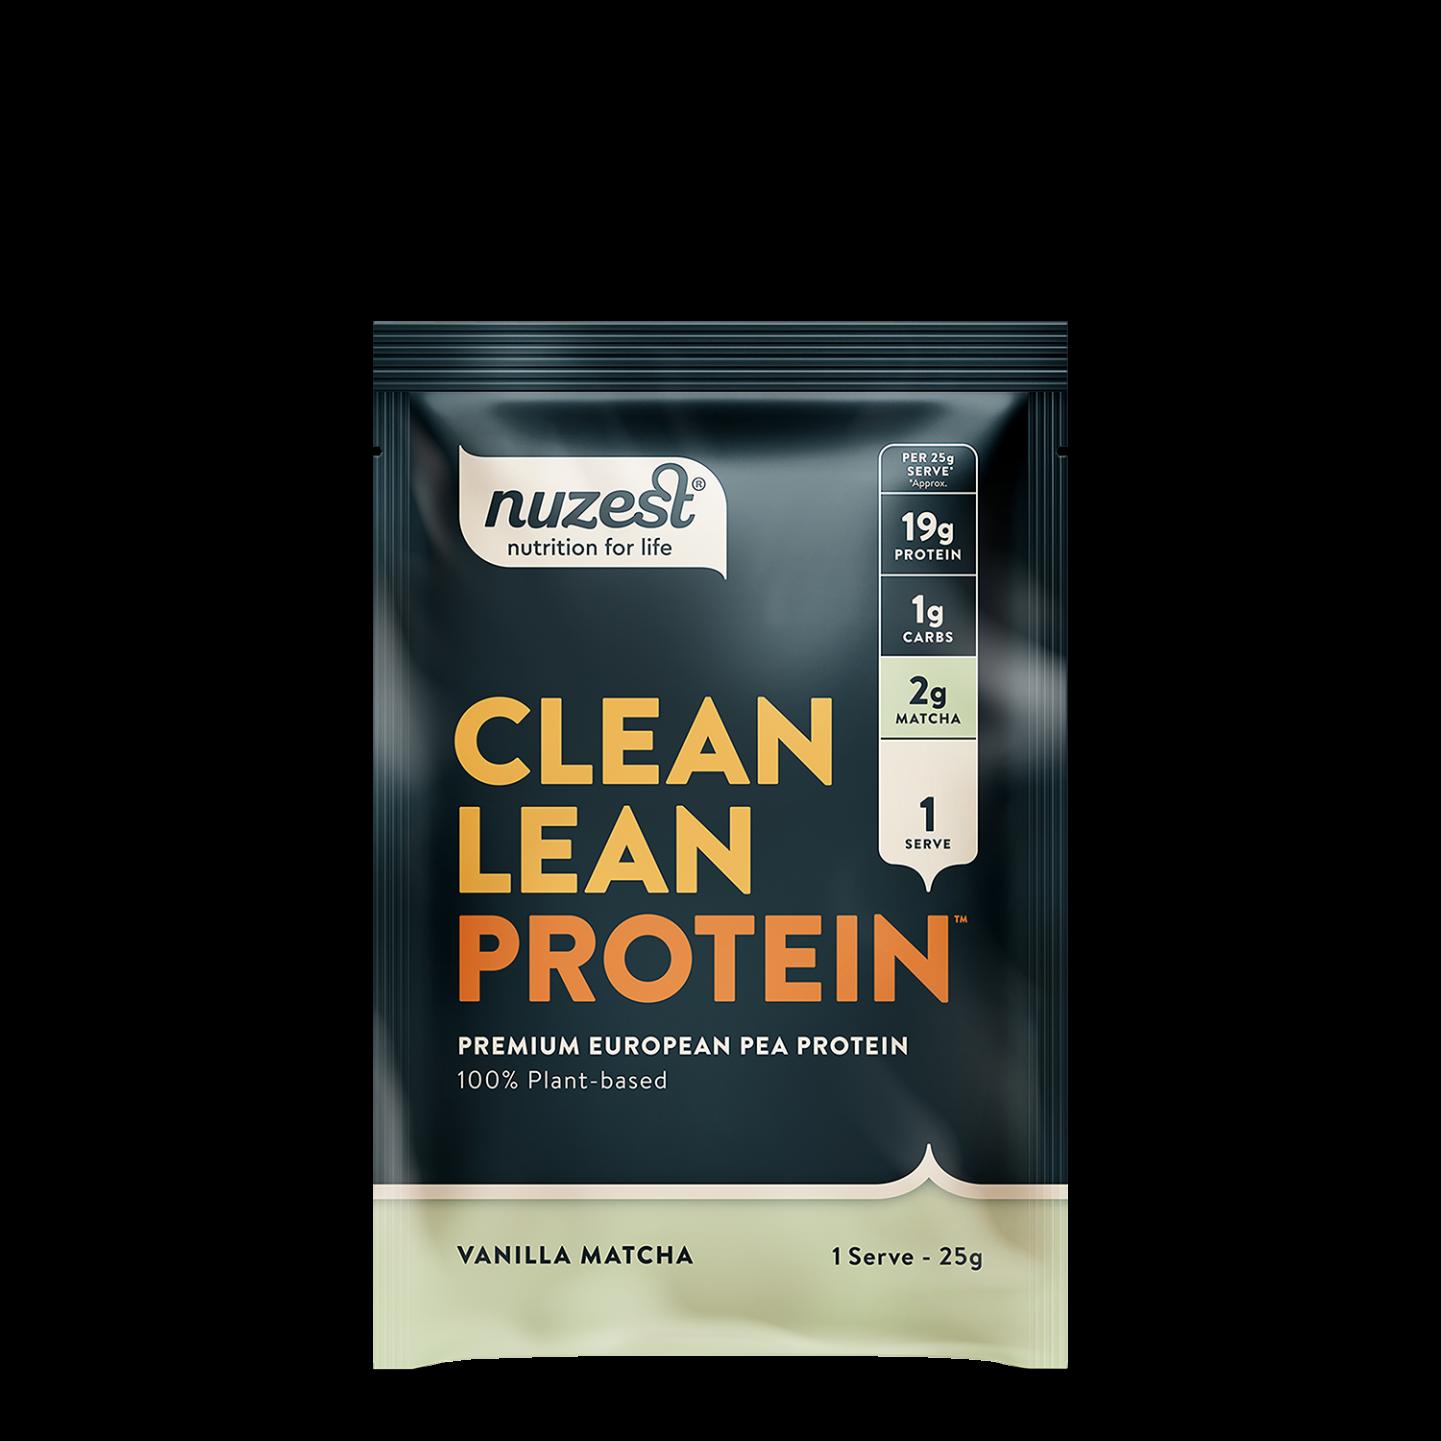 Clean Lean Protein Vanilla Matcha 25g SINGLE